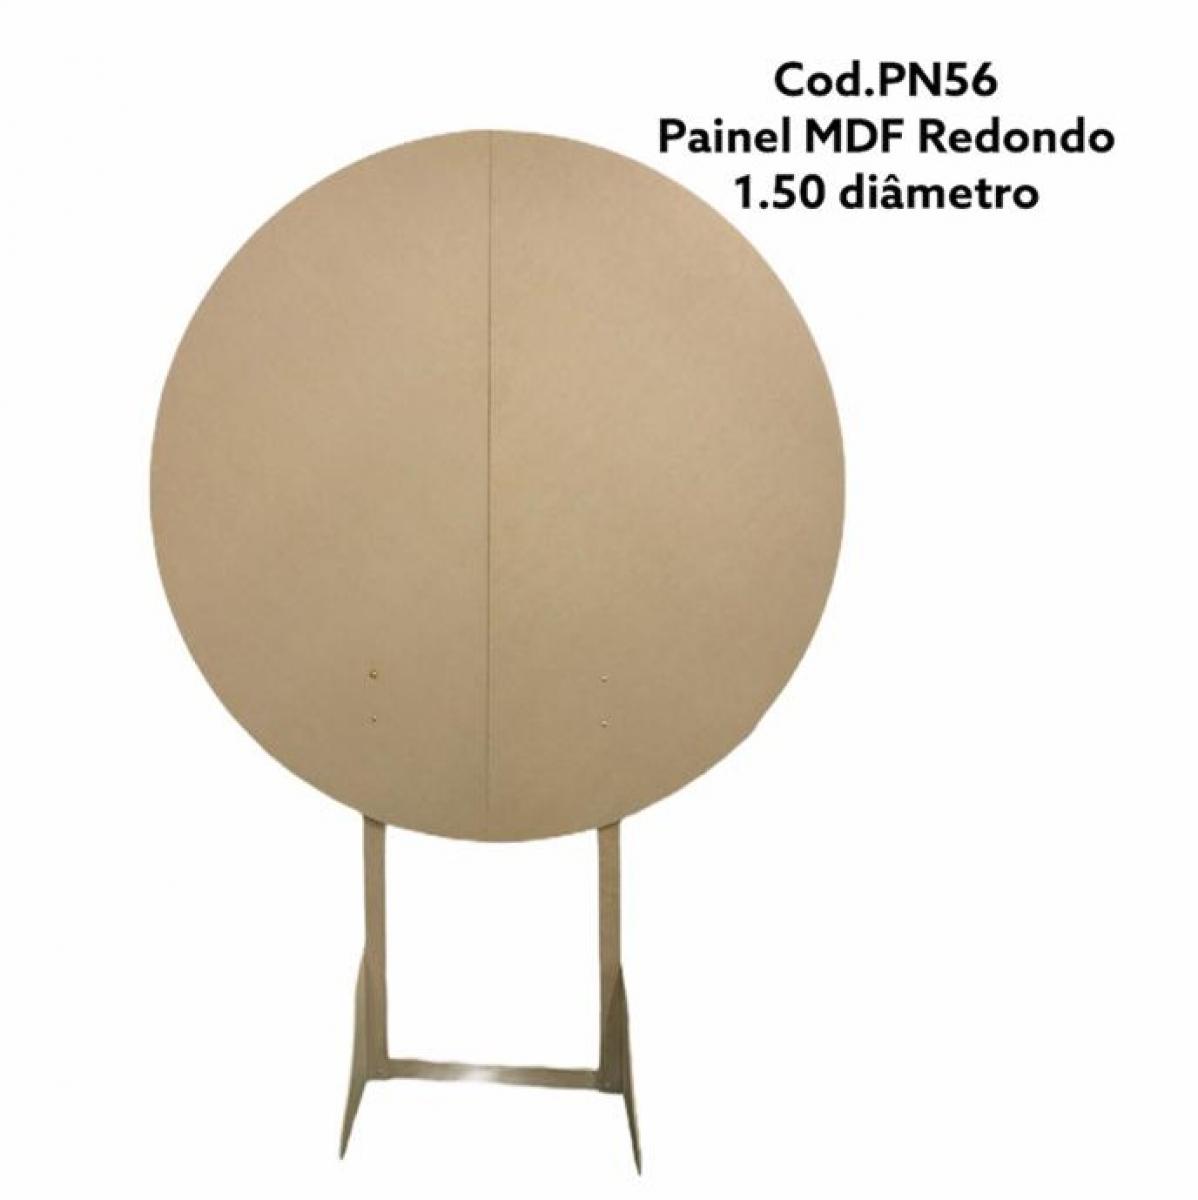 PN56 PAINEL REDONDO